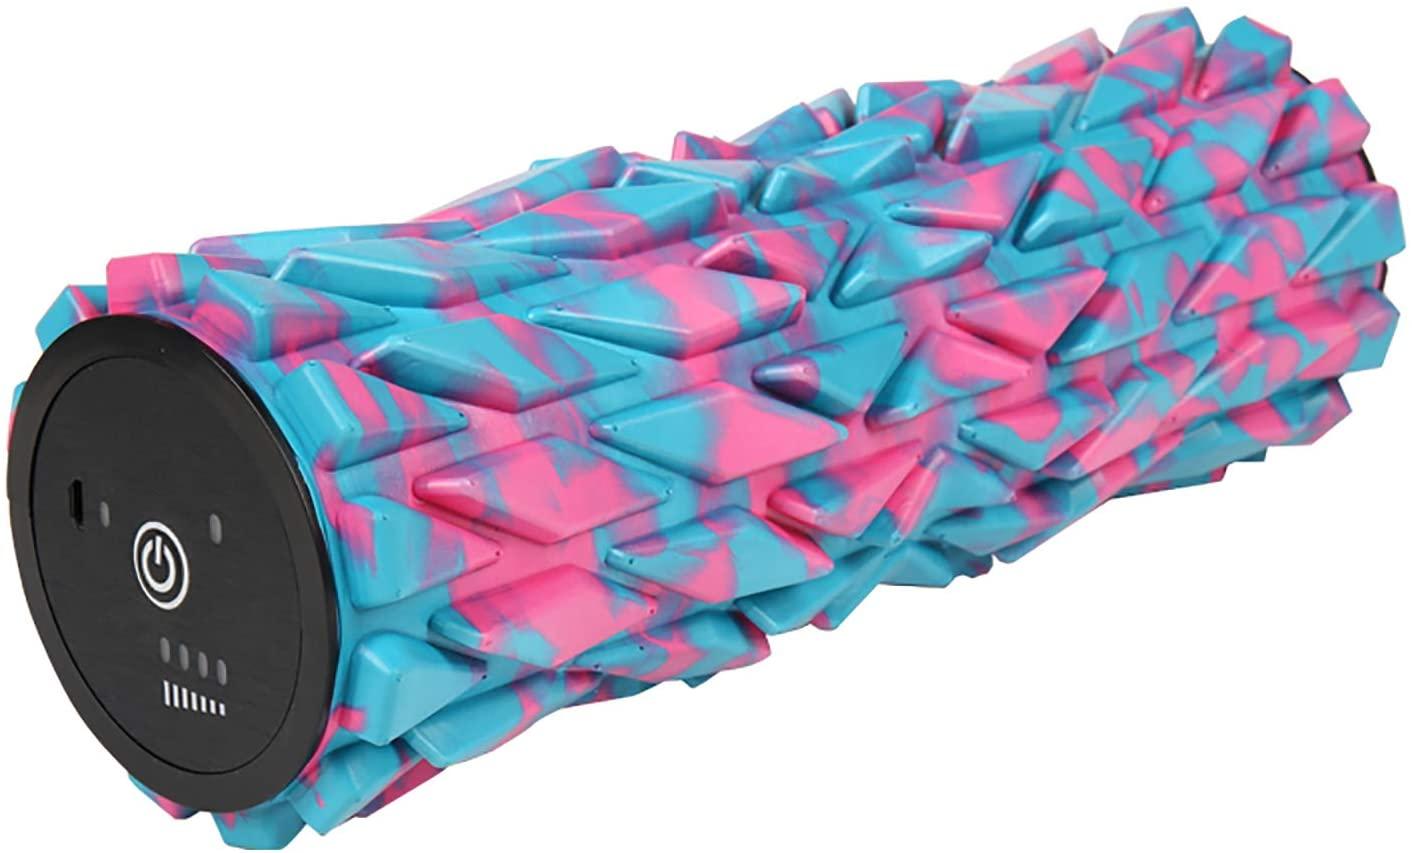 Body Foam Roller Deep Tissue Massager, High Medium Low Density Foam Roller Soft, Foam Roller for Physical Therapy Exercise, Foam Roller Workout Equipment, Massage Foam Roller Trigger Point Set Kit